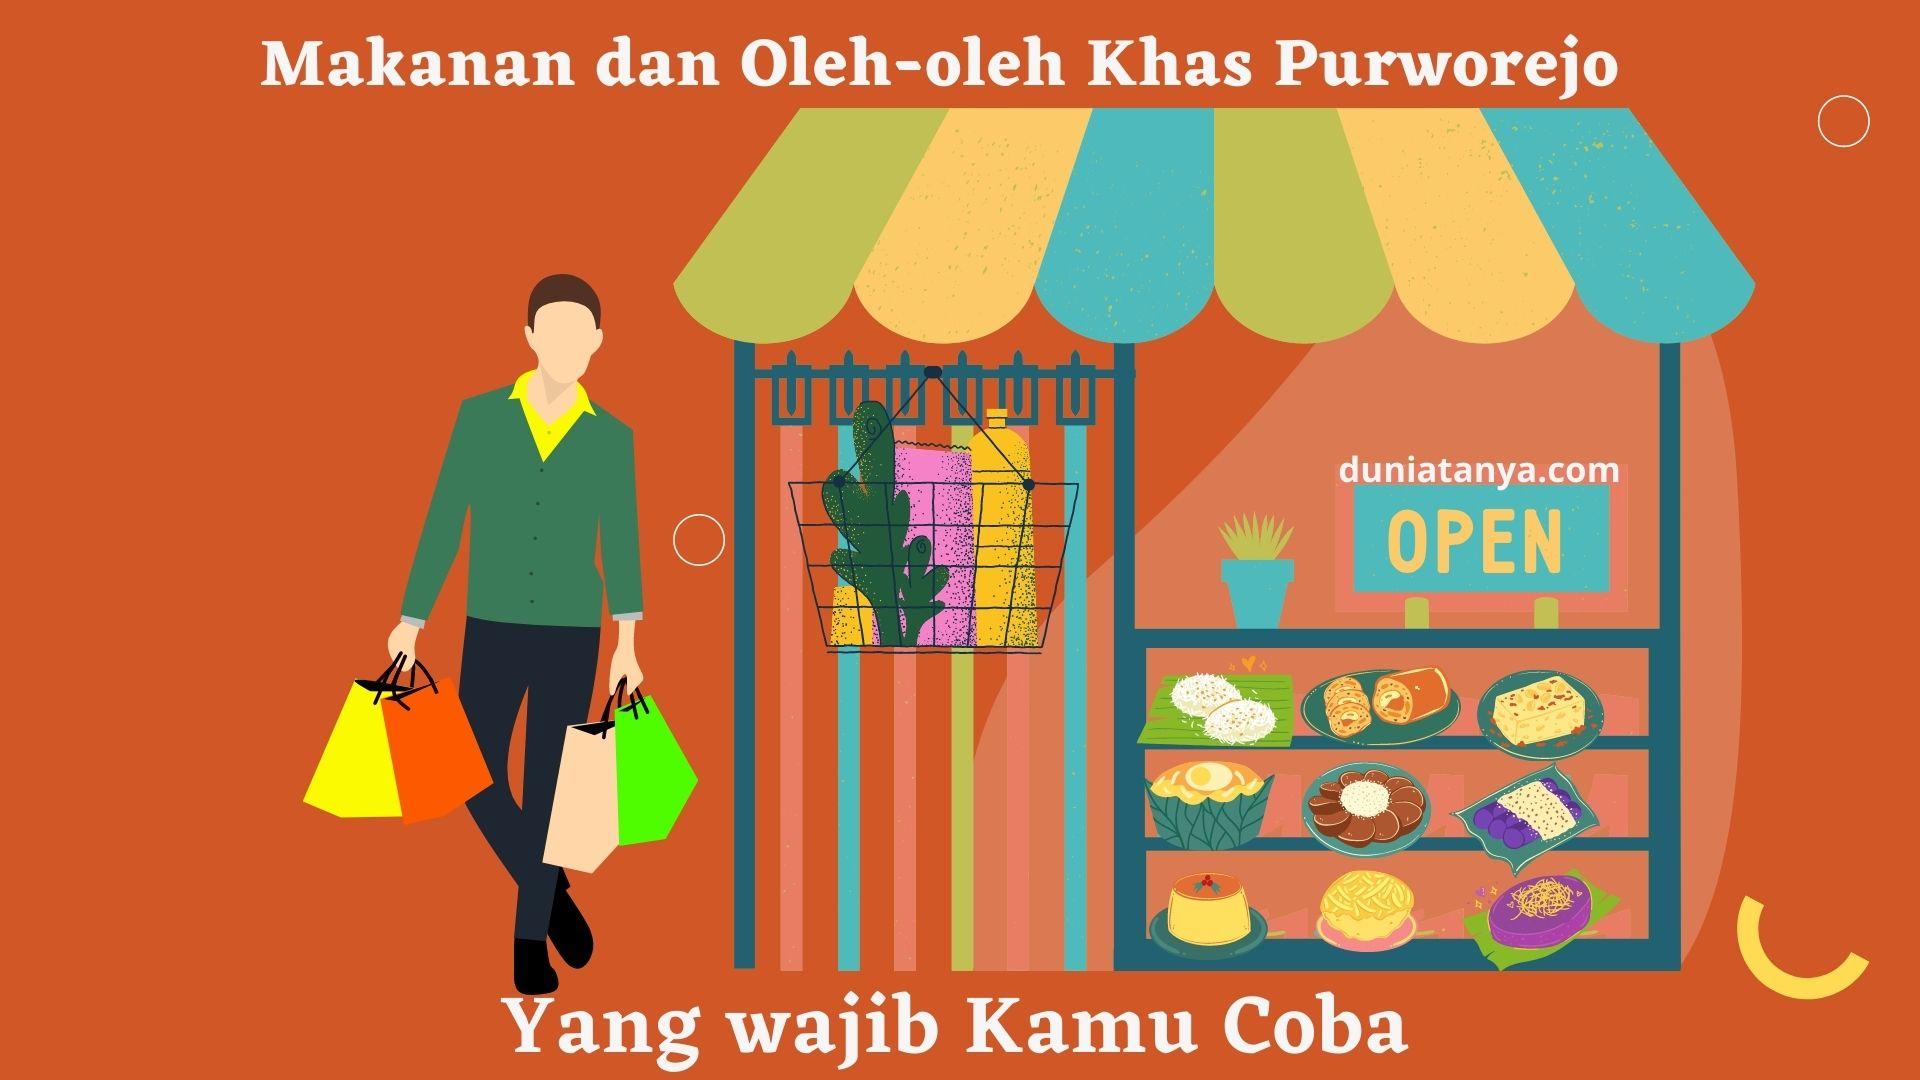 You are currently viewing Makanan dan Oleh-oleh Khas Purworejo yang wajib Kamu Coba